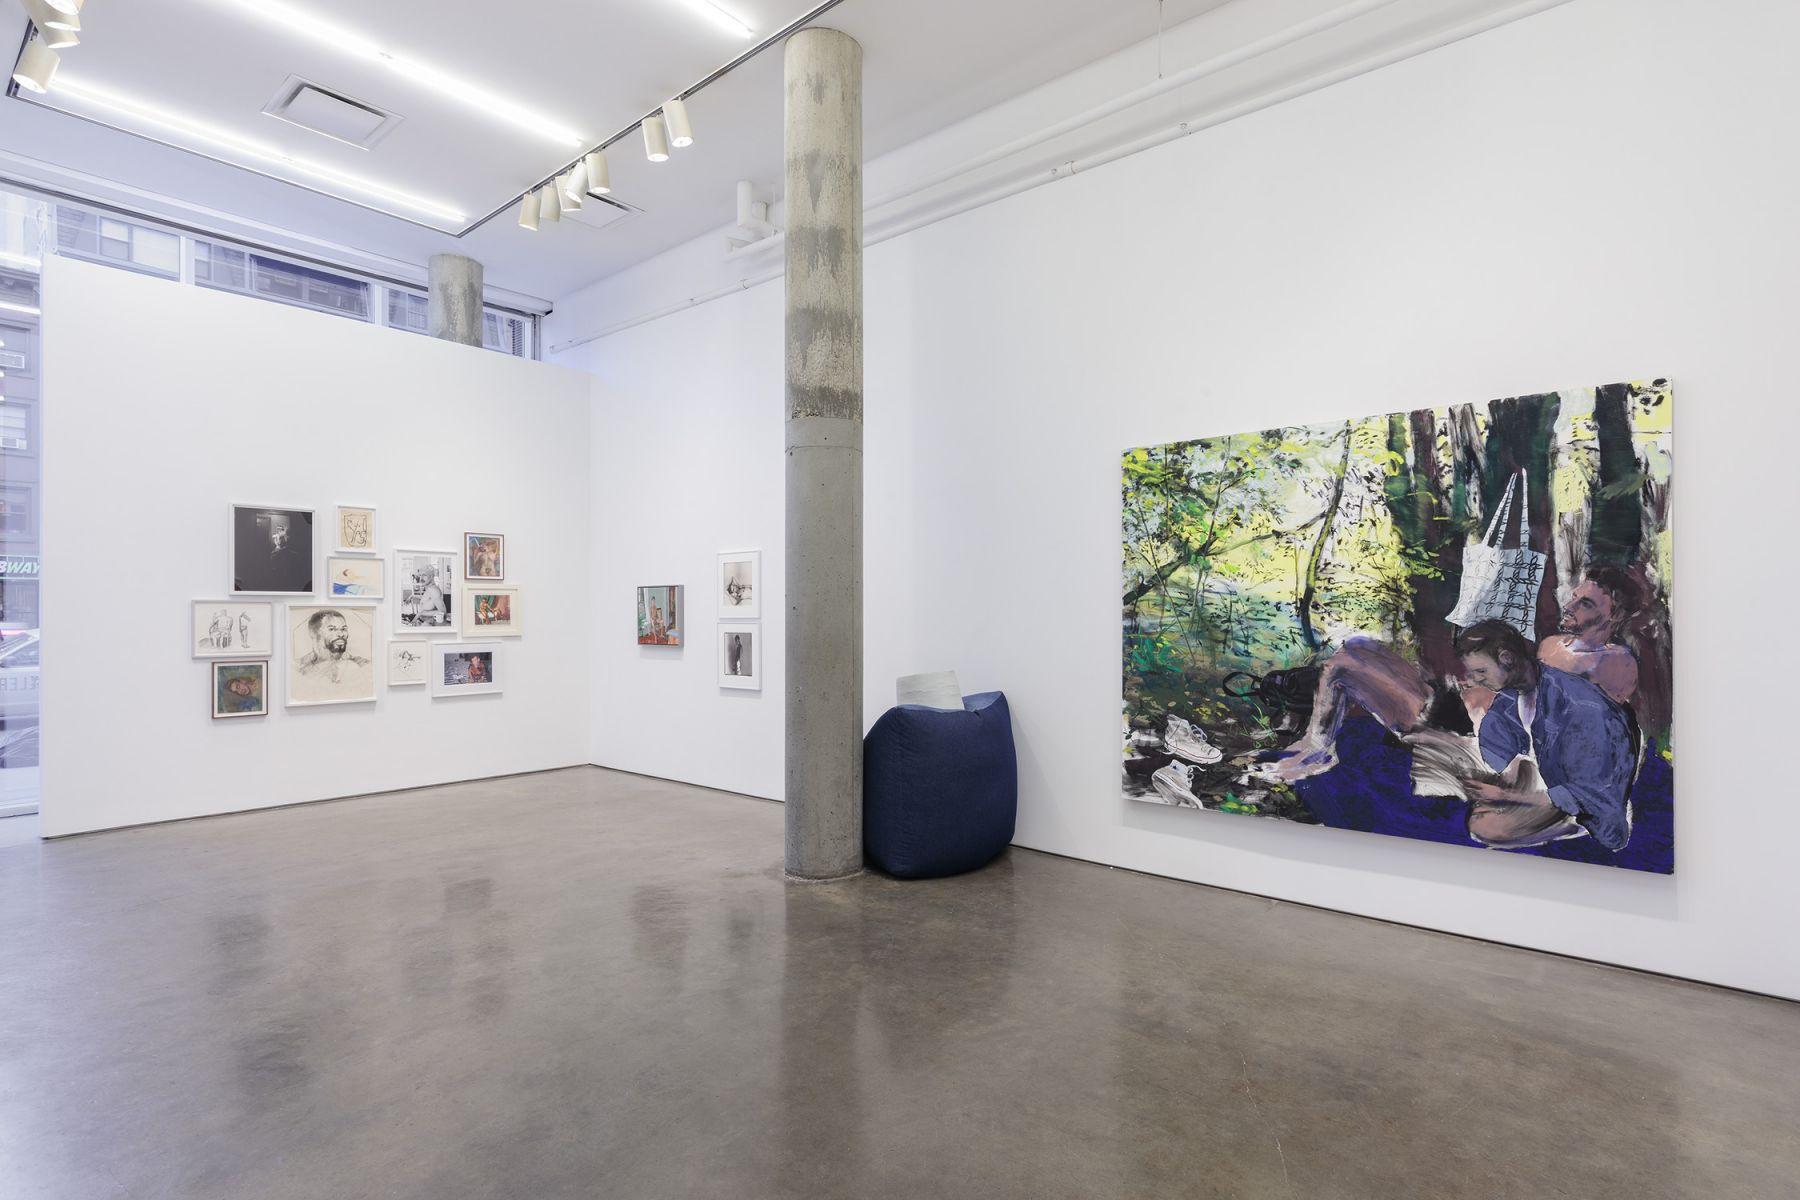 Intimacy, installation view, Yossi Milo Gallery, New York, NY (2018)